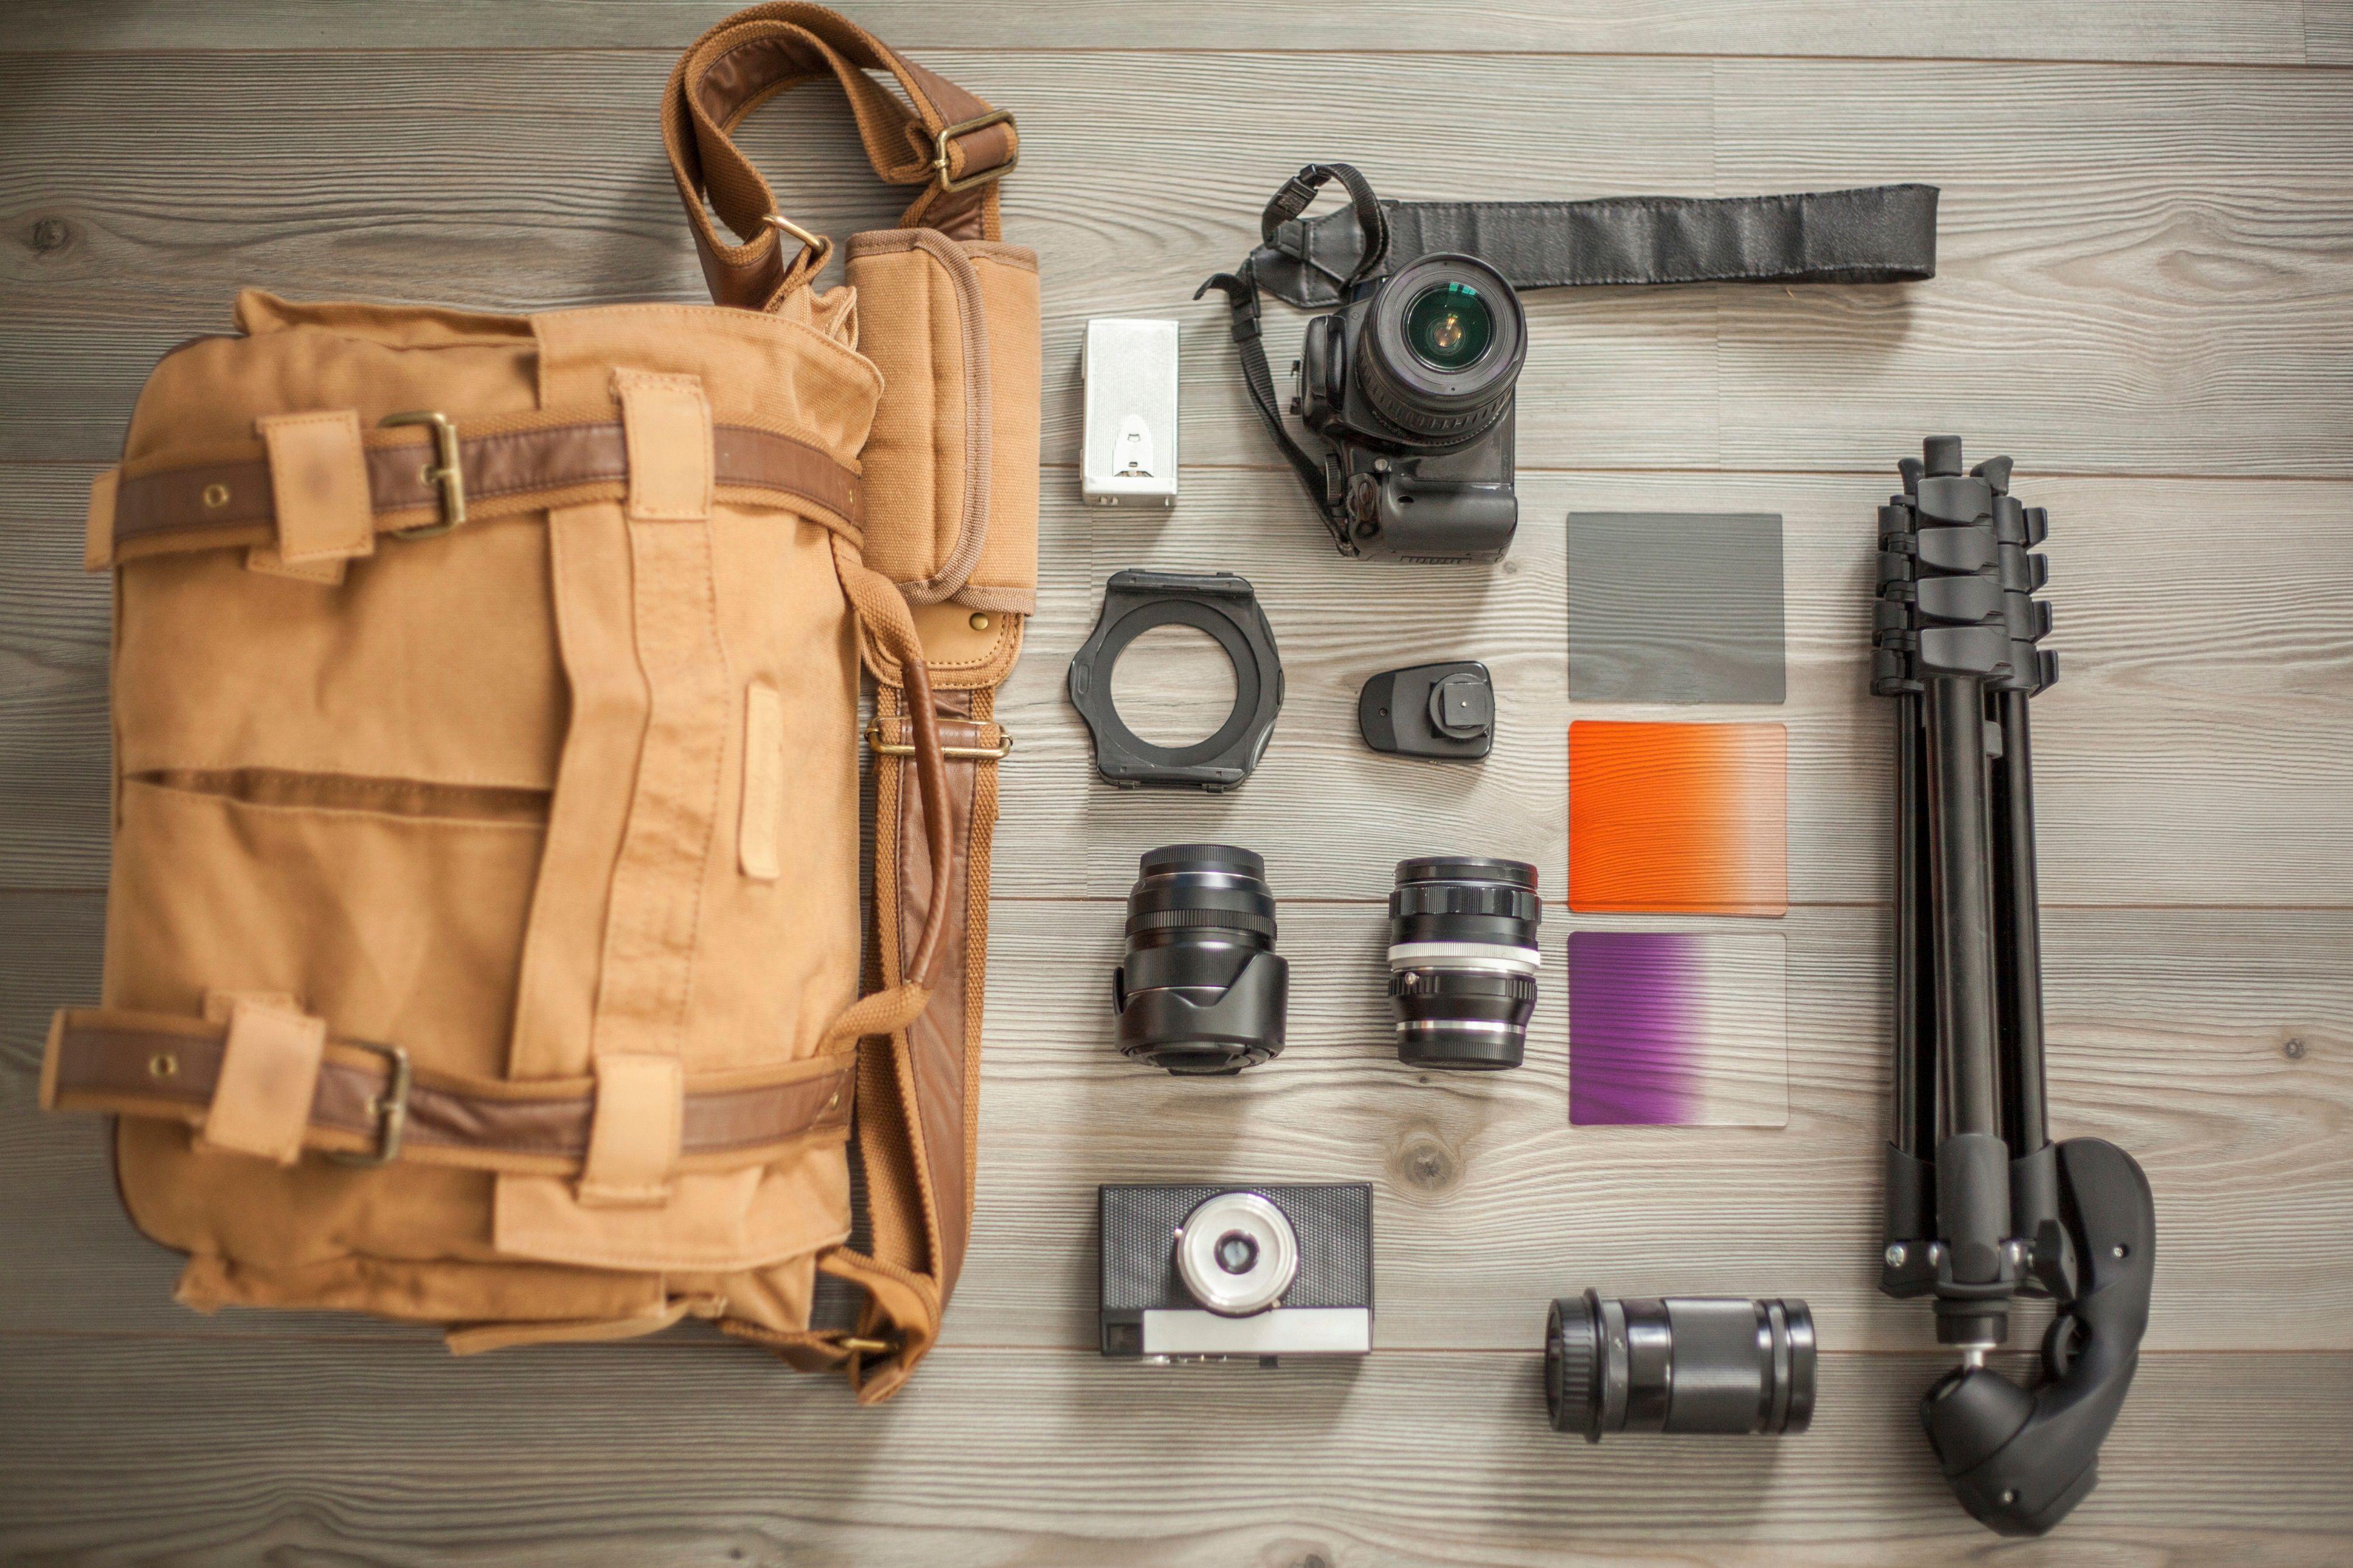 Contents of a camera bag displayed